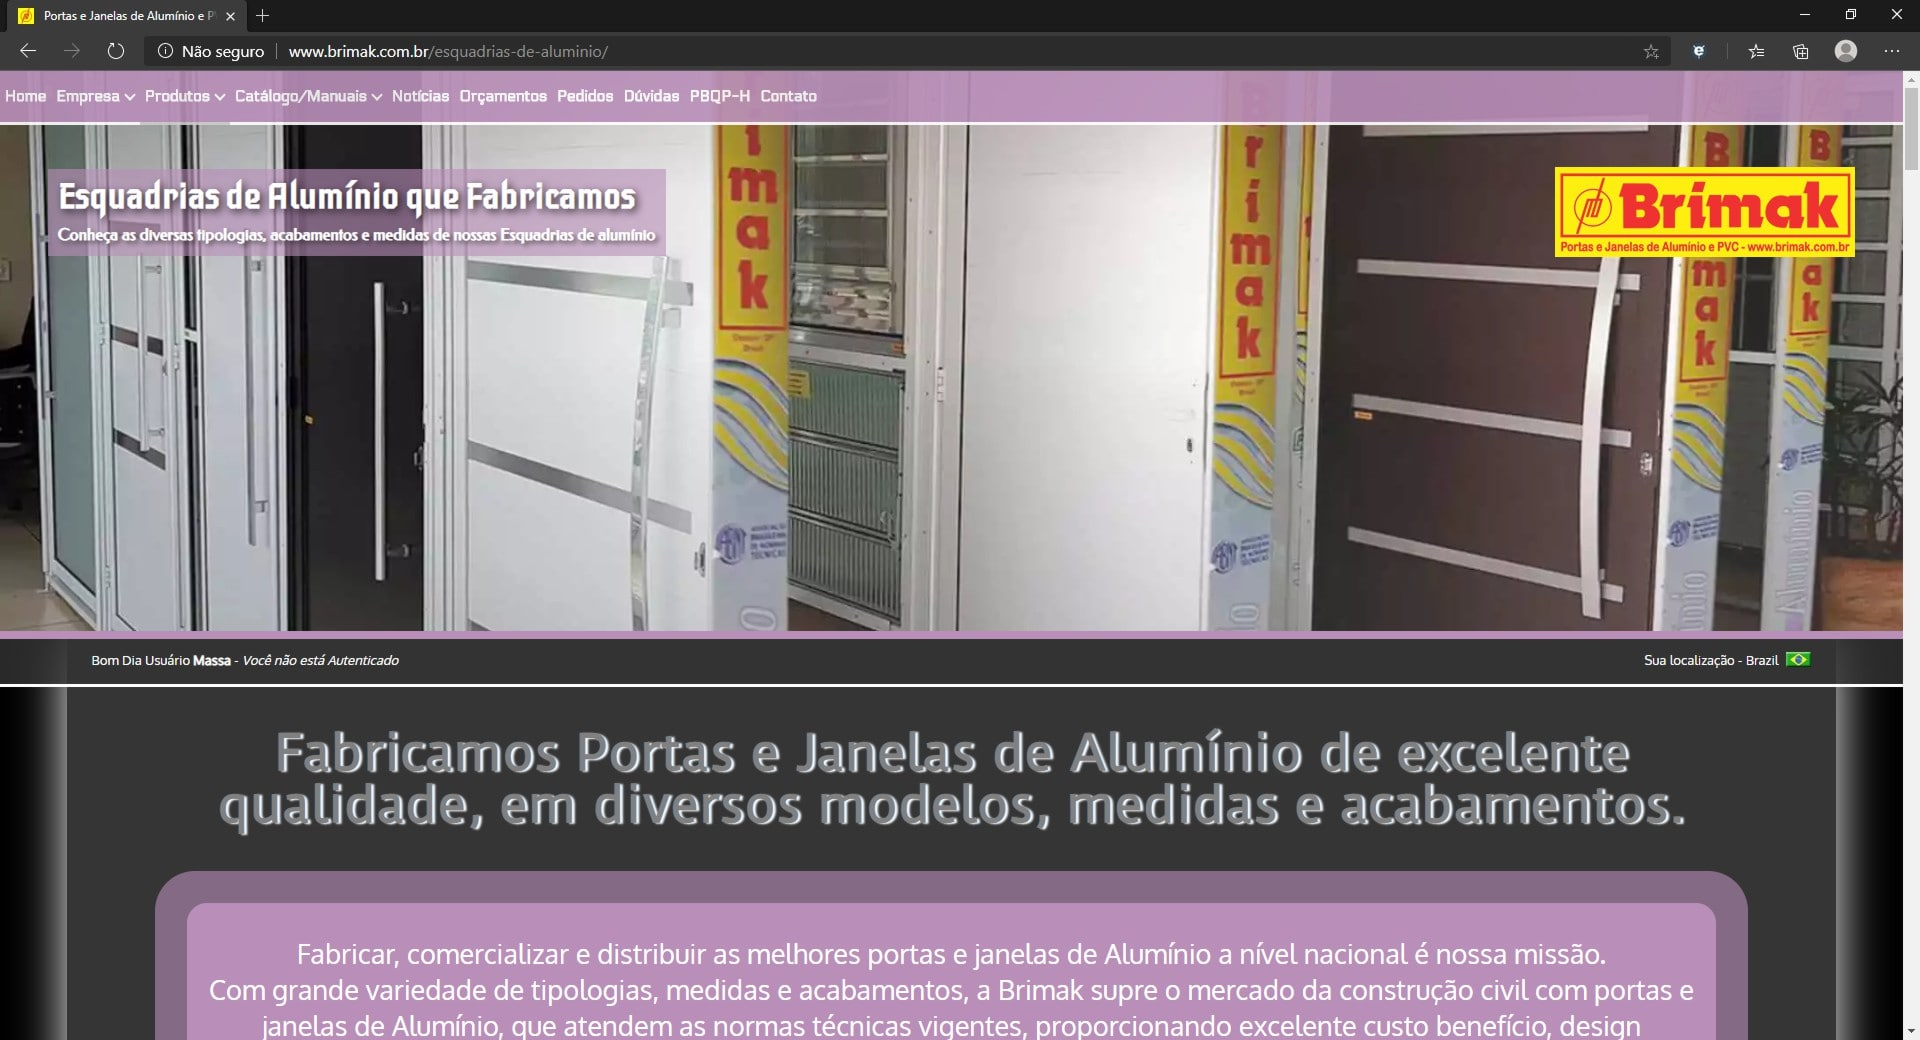 #C7BB04 Fabrica De Janelas De Aluminio Rj Pictures to pin on Pinterest 982 Porta E Janela De Aluminio Rj